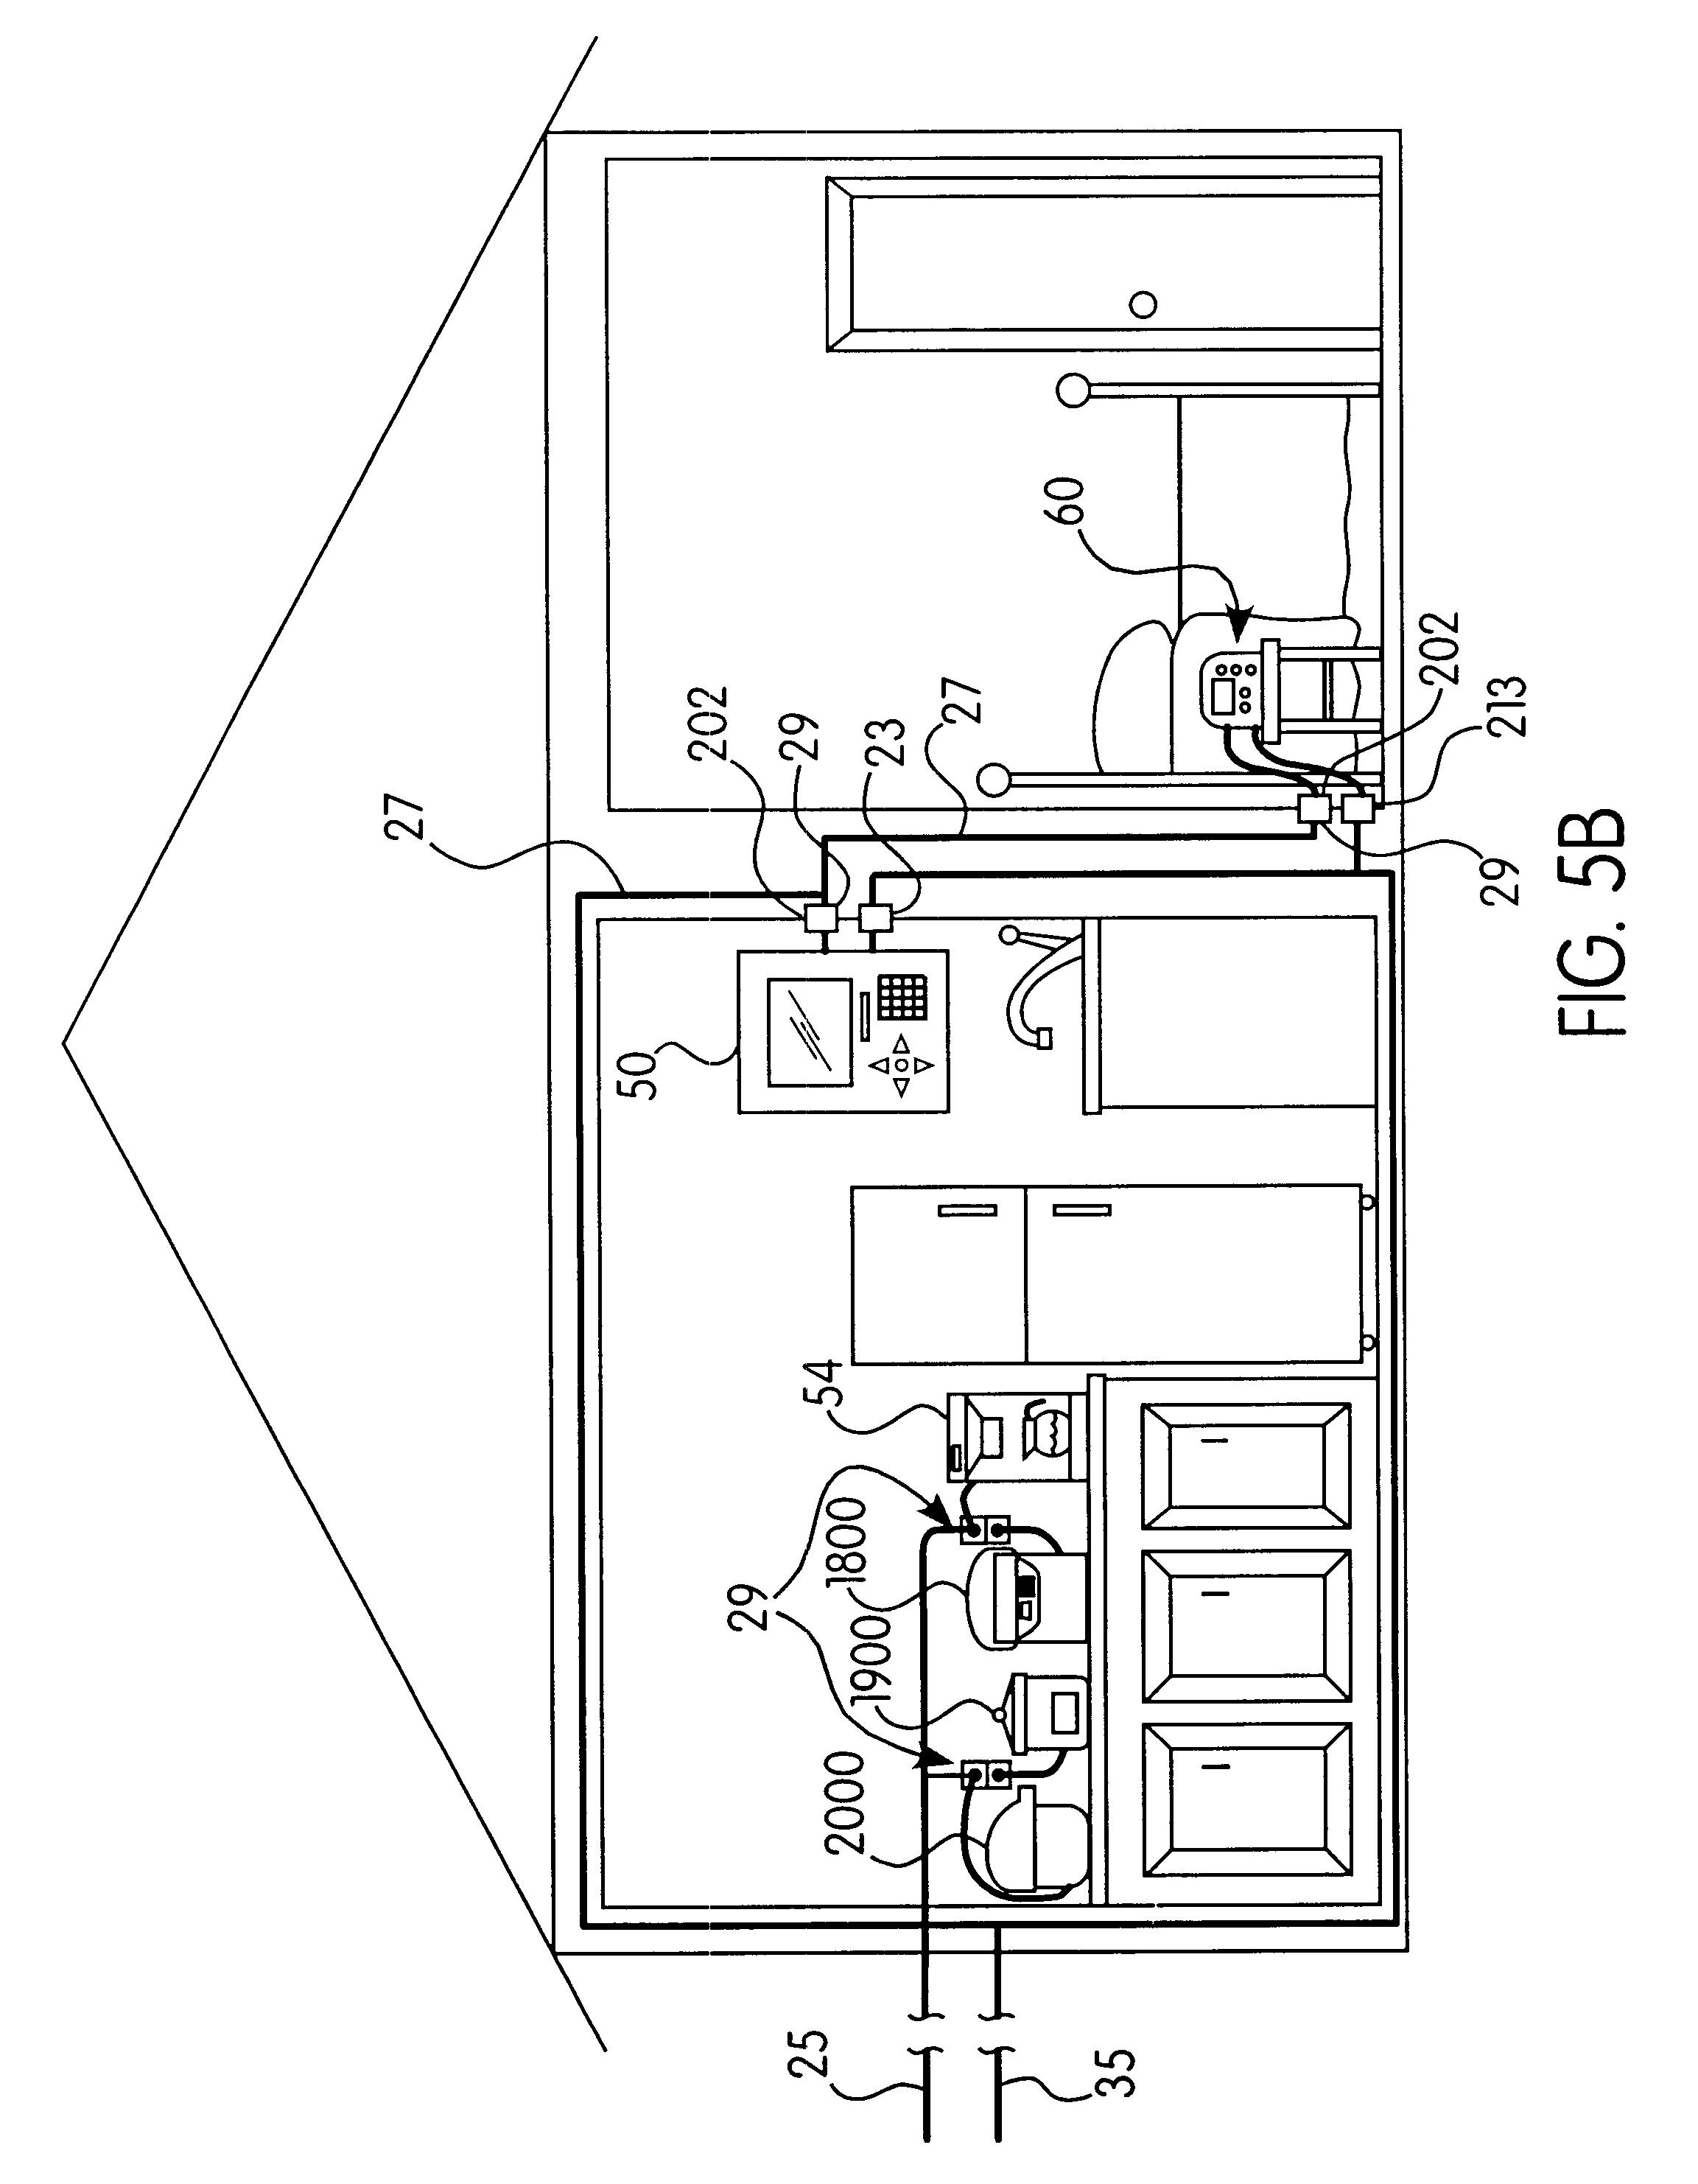 Patent Us 6587739 B1 Simple Ic 555 Automatic Bedroom Night Lamp Circuit Diagram Image